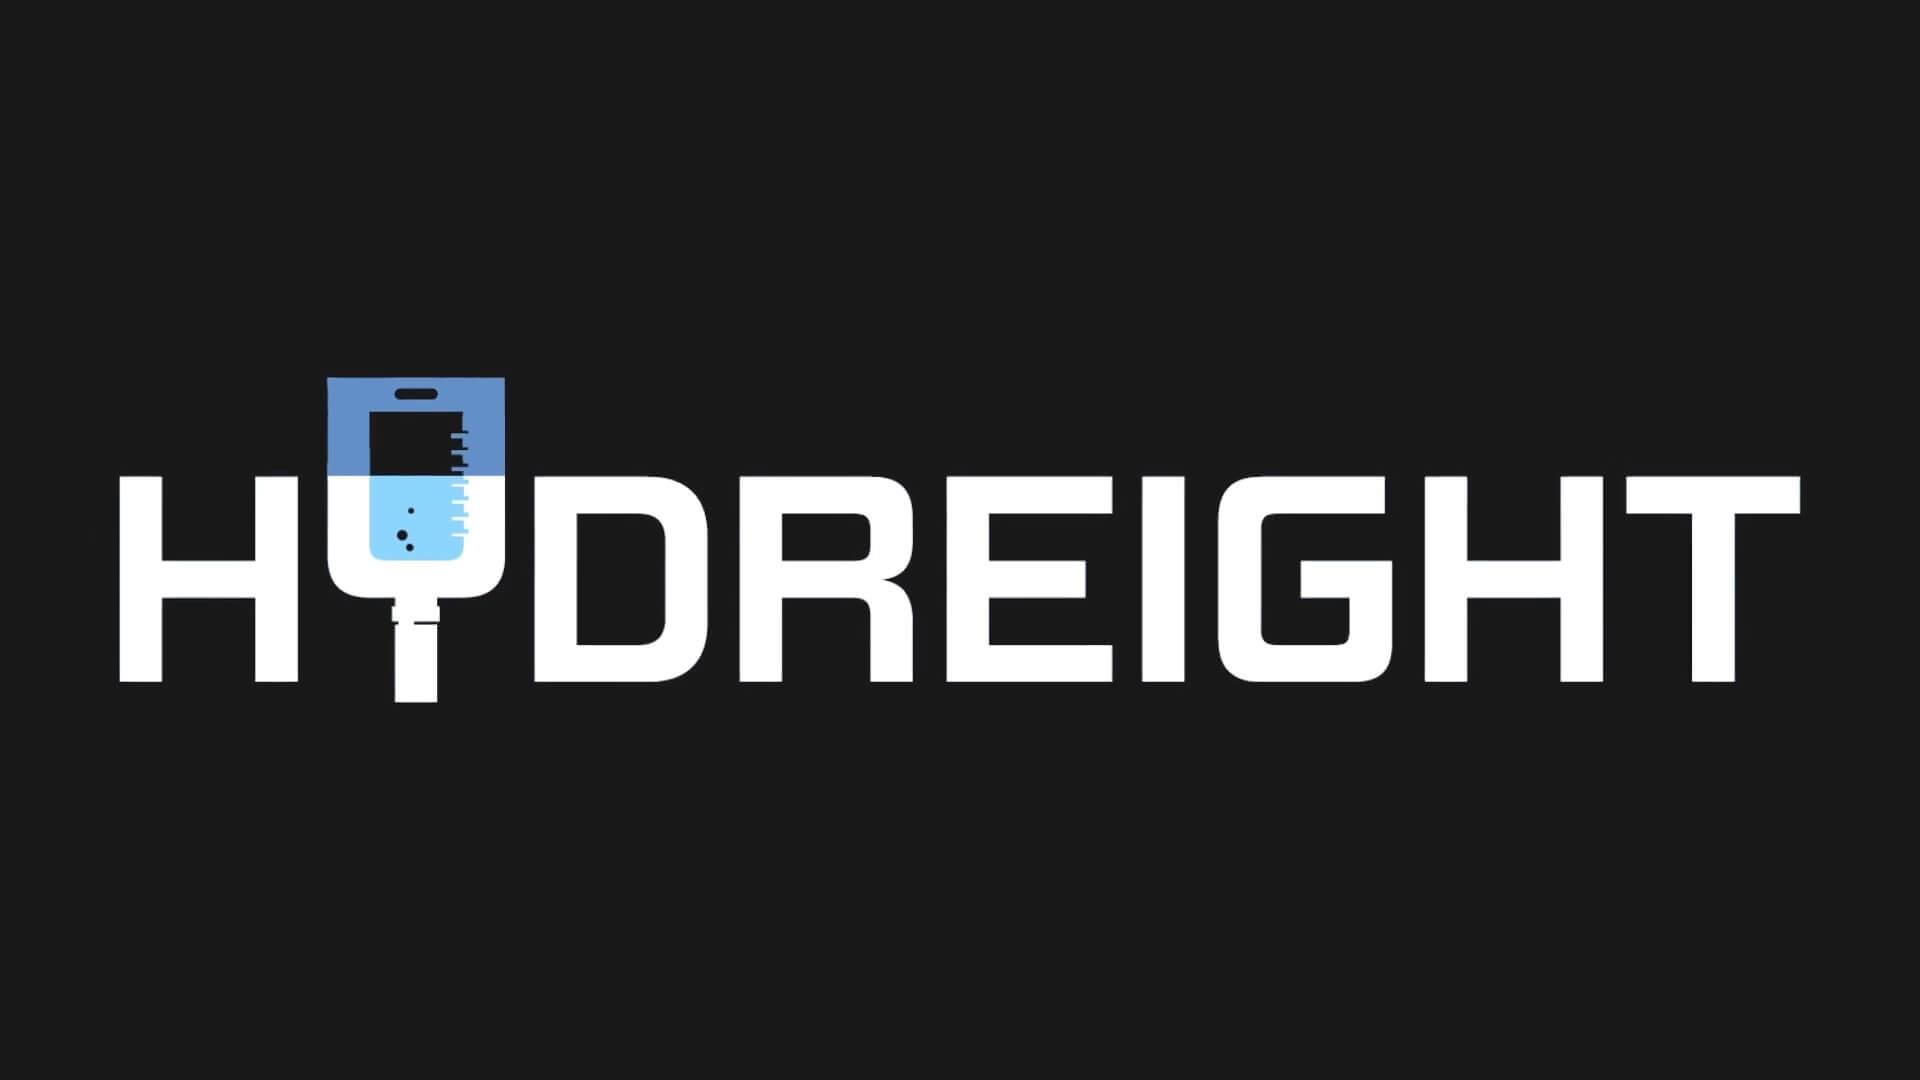 Hydreight